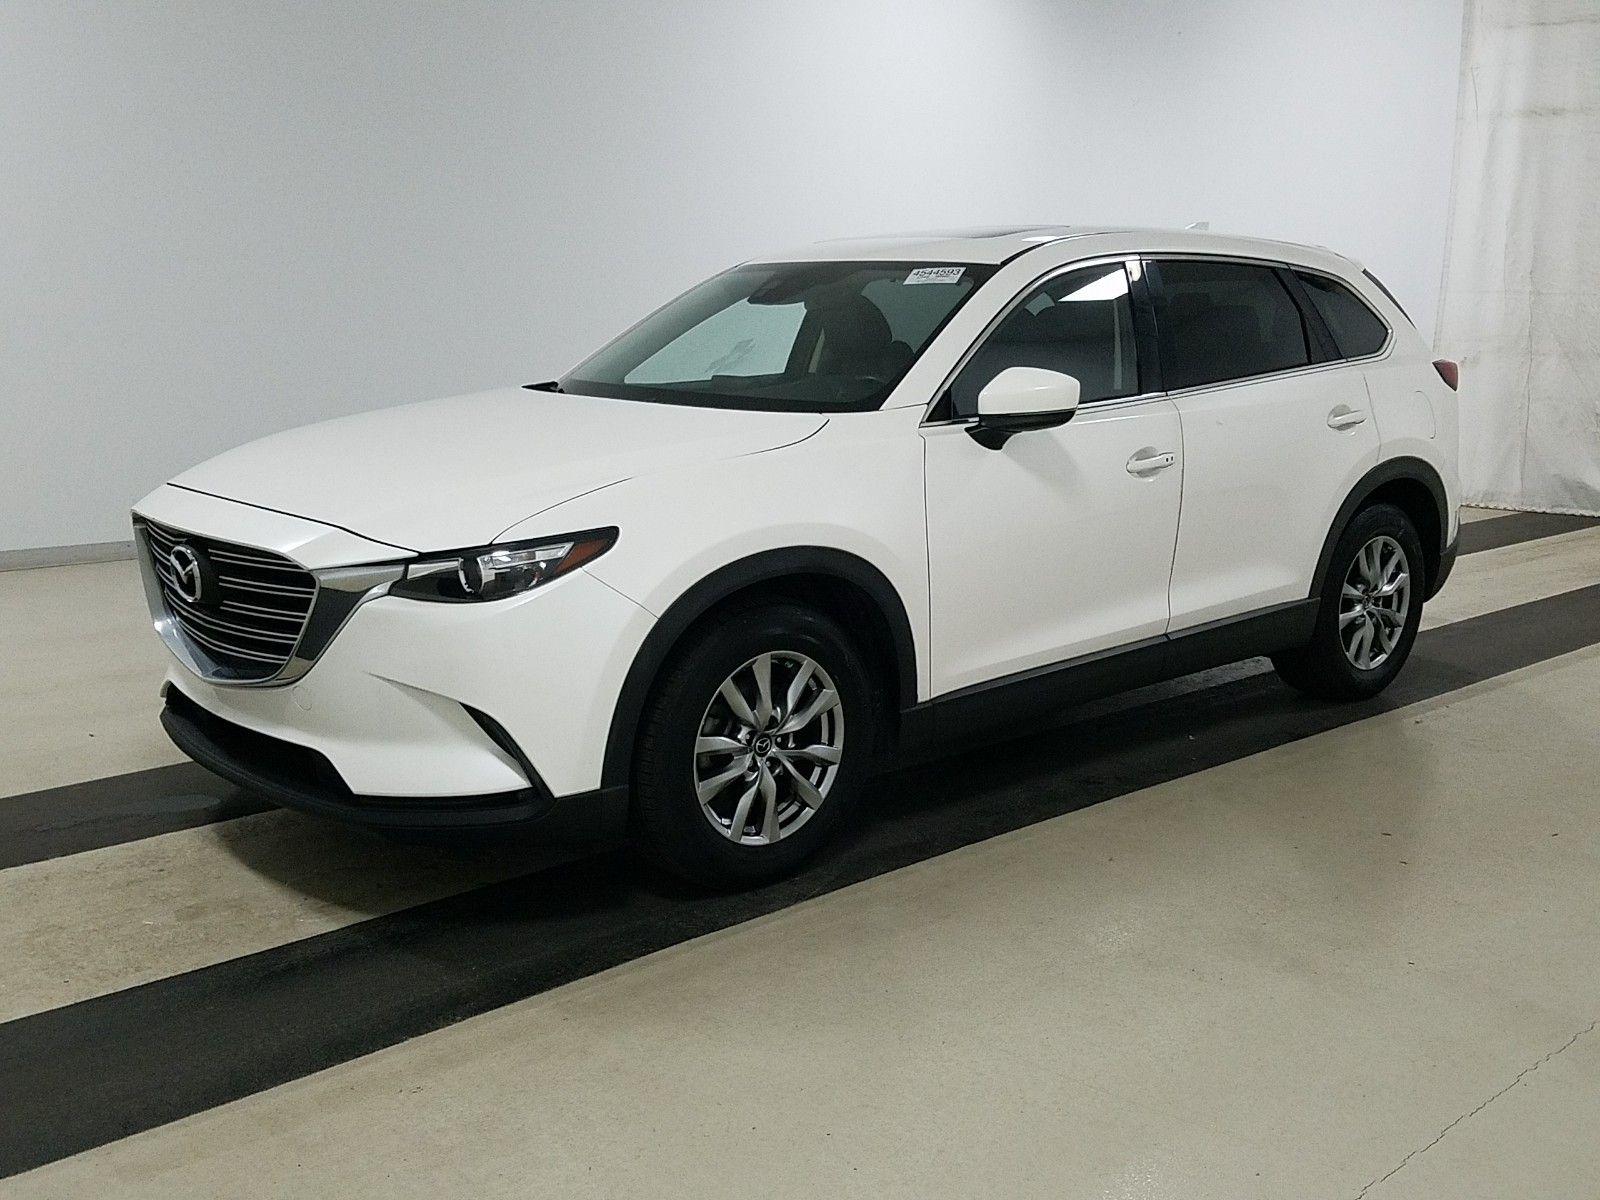 2017 Mazda Cx-9 2.5. Lot 99915992071 Vin JM3TCACY5H0129530